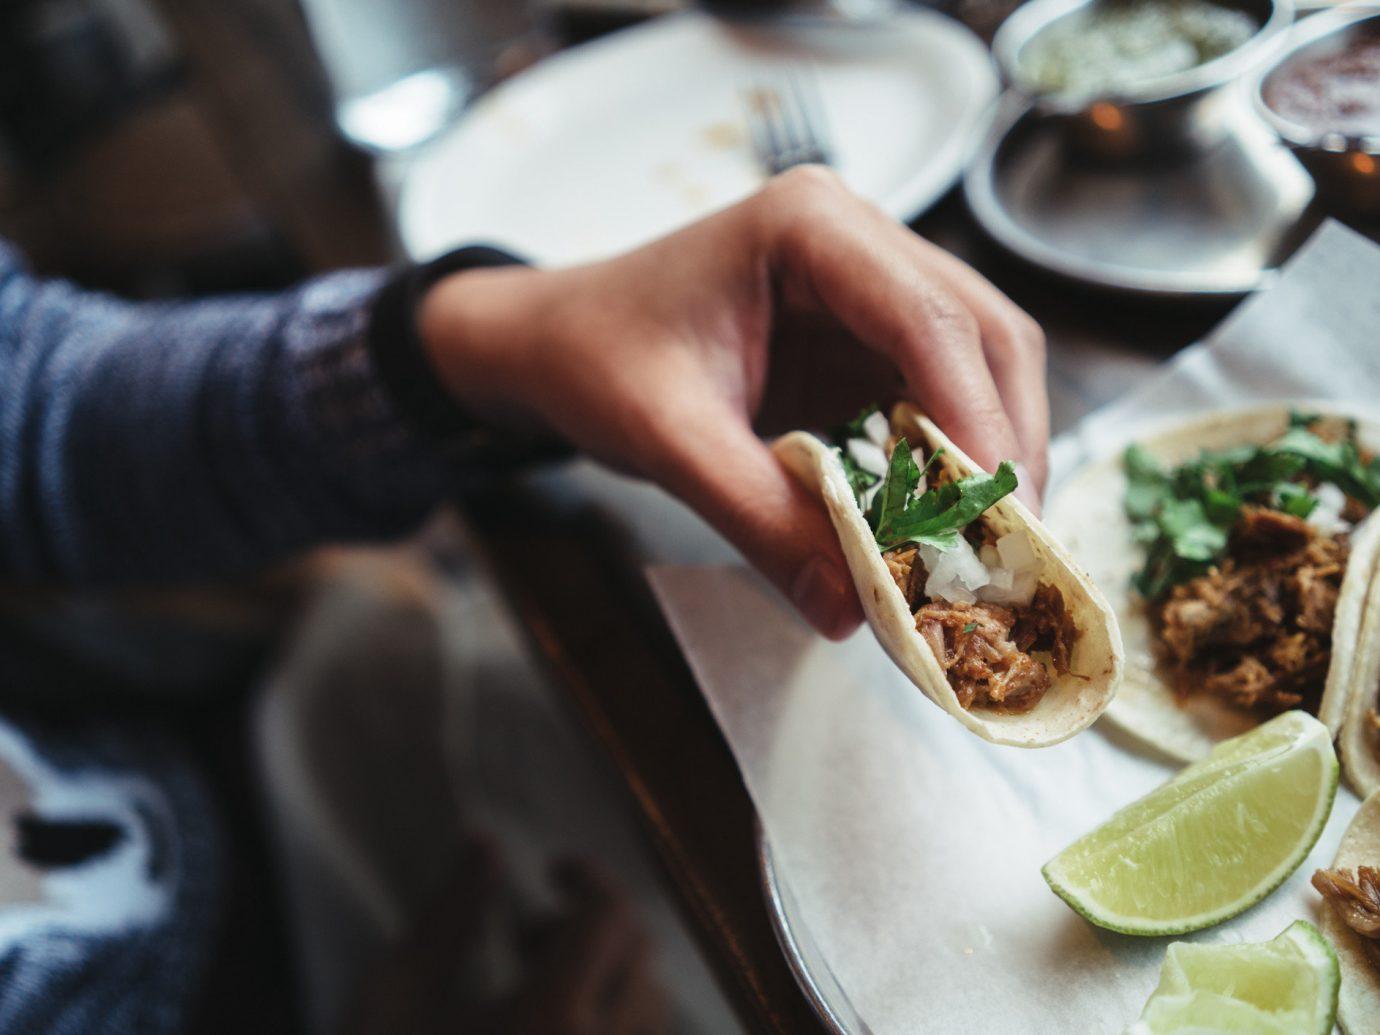 Food + Drink food person plate indoor dish meal restaurant Seafood cuisine sense